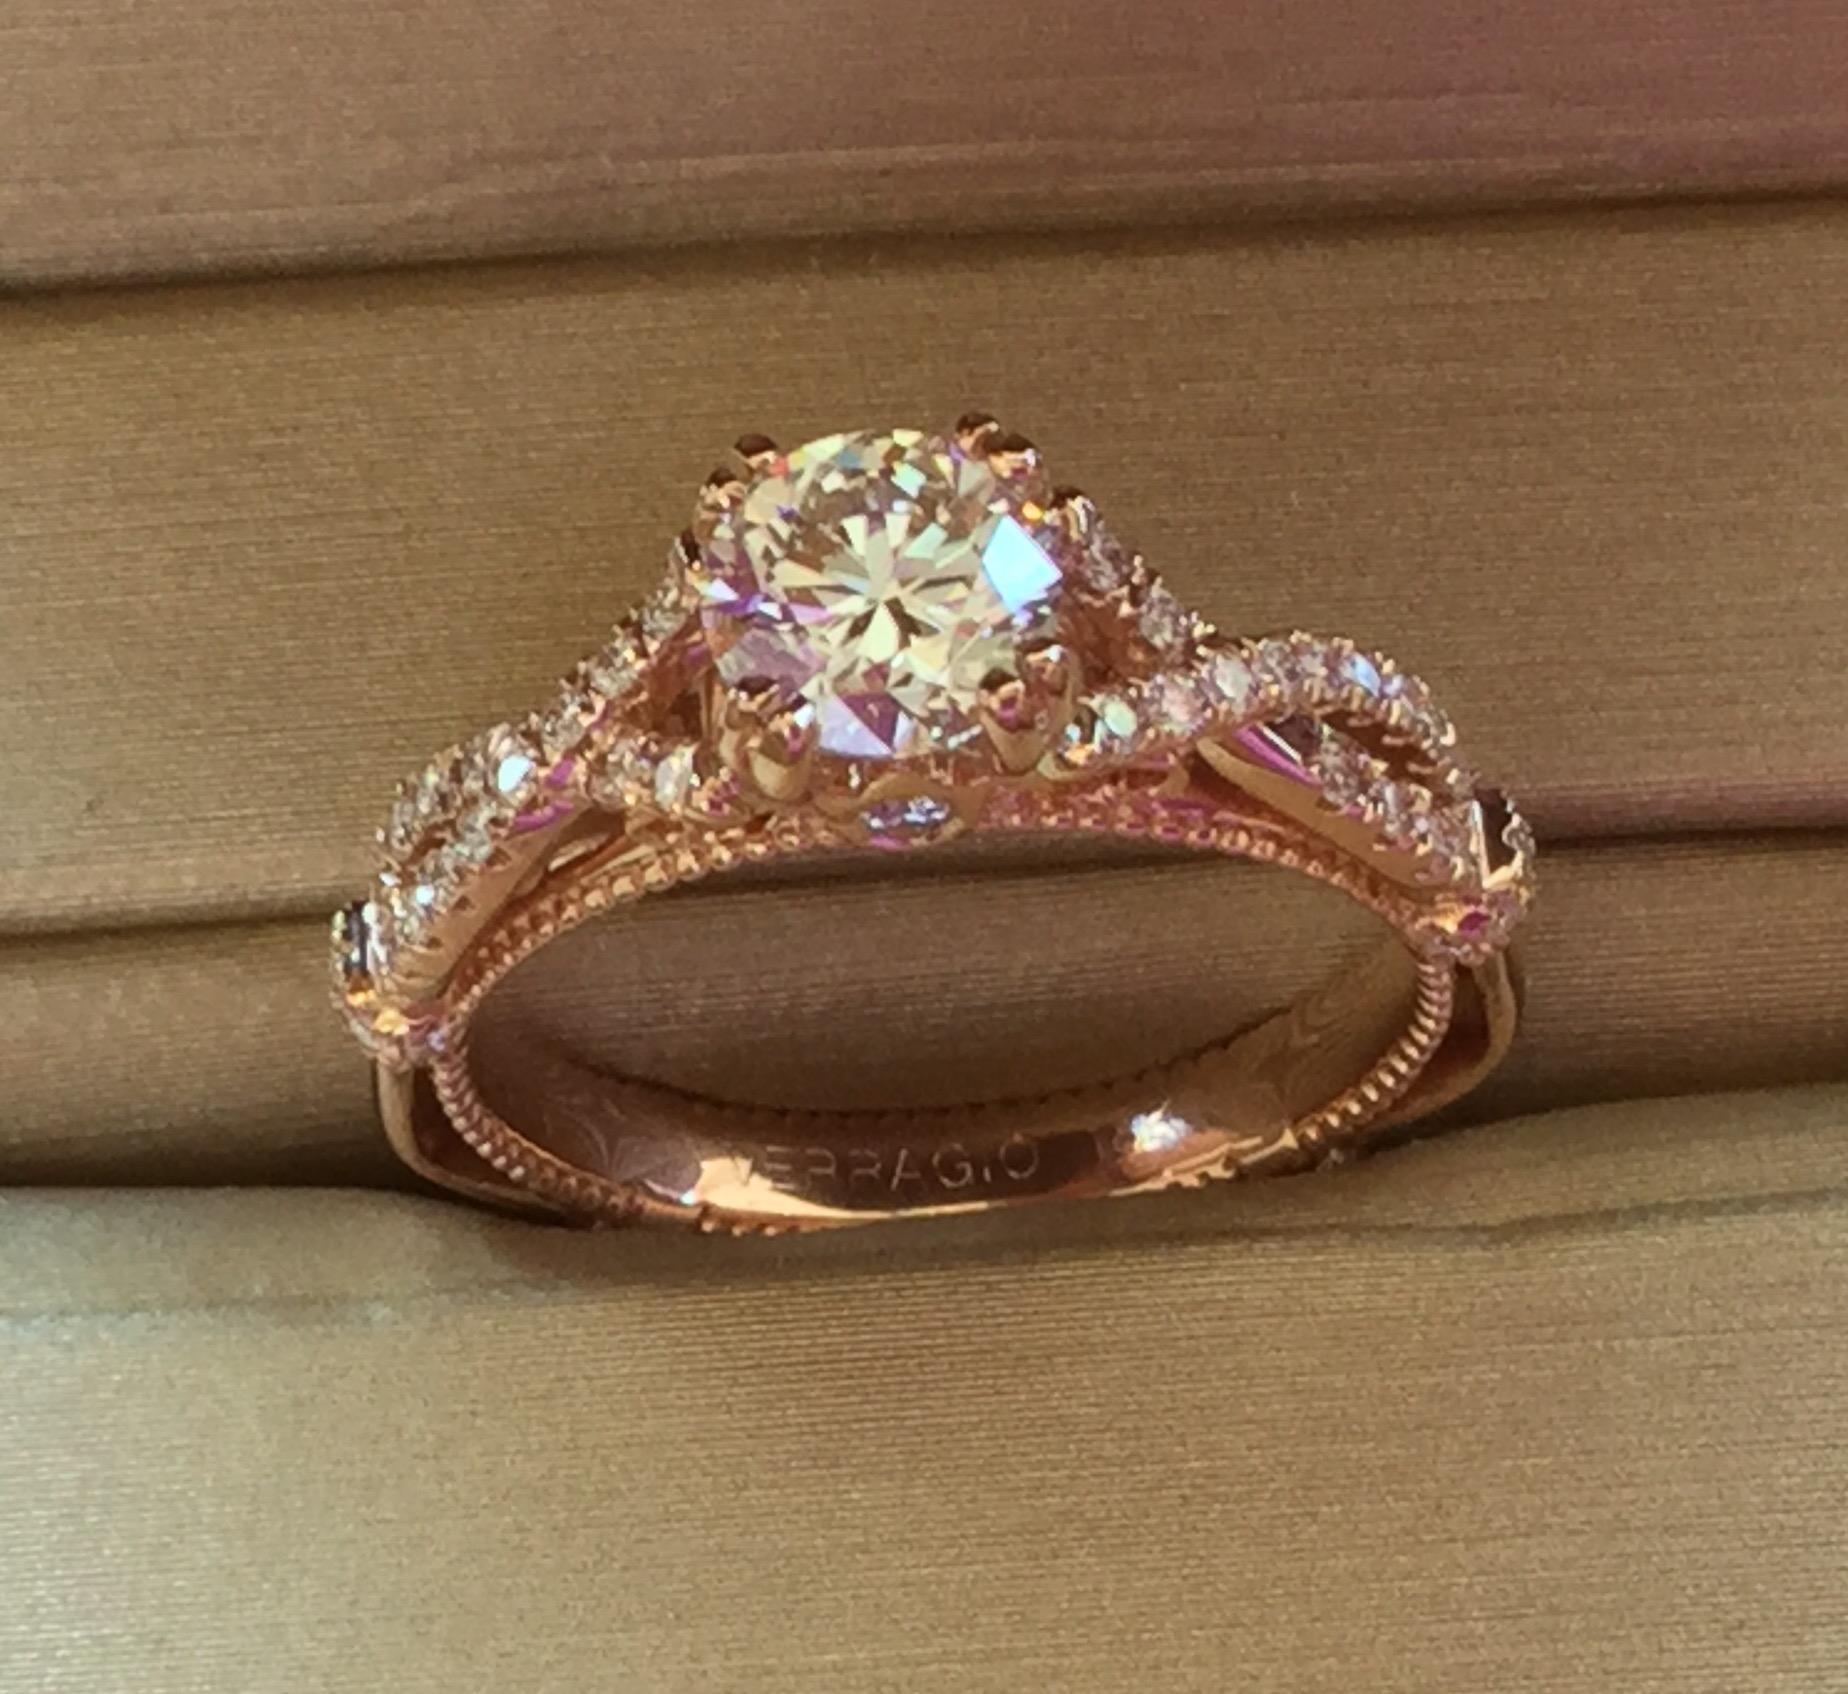 Emerald Lady Jewelry image 20